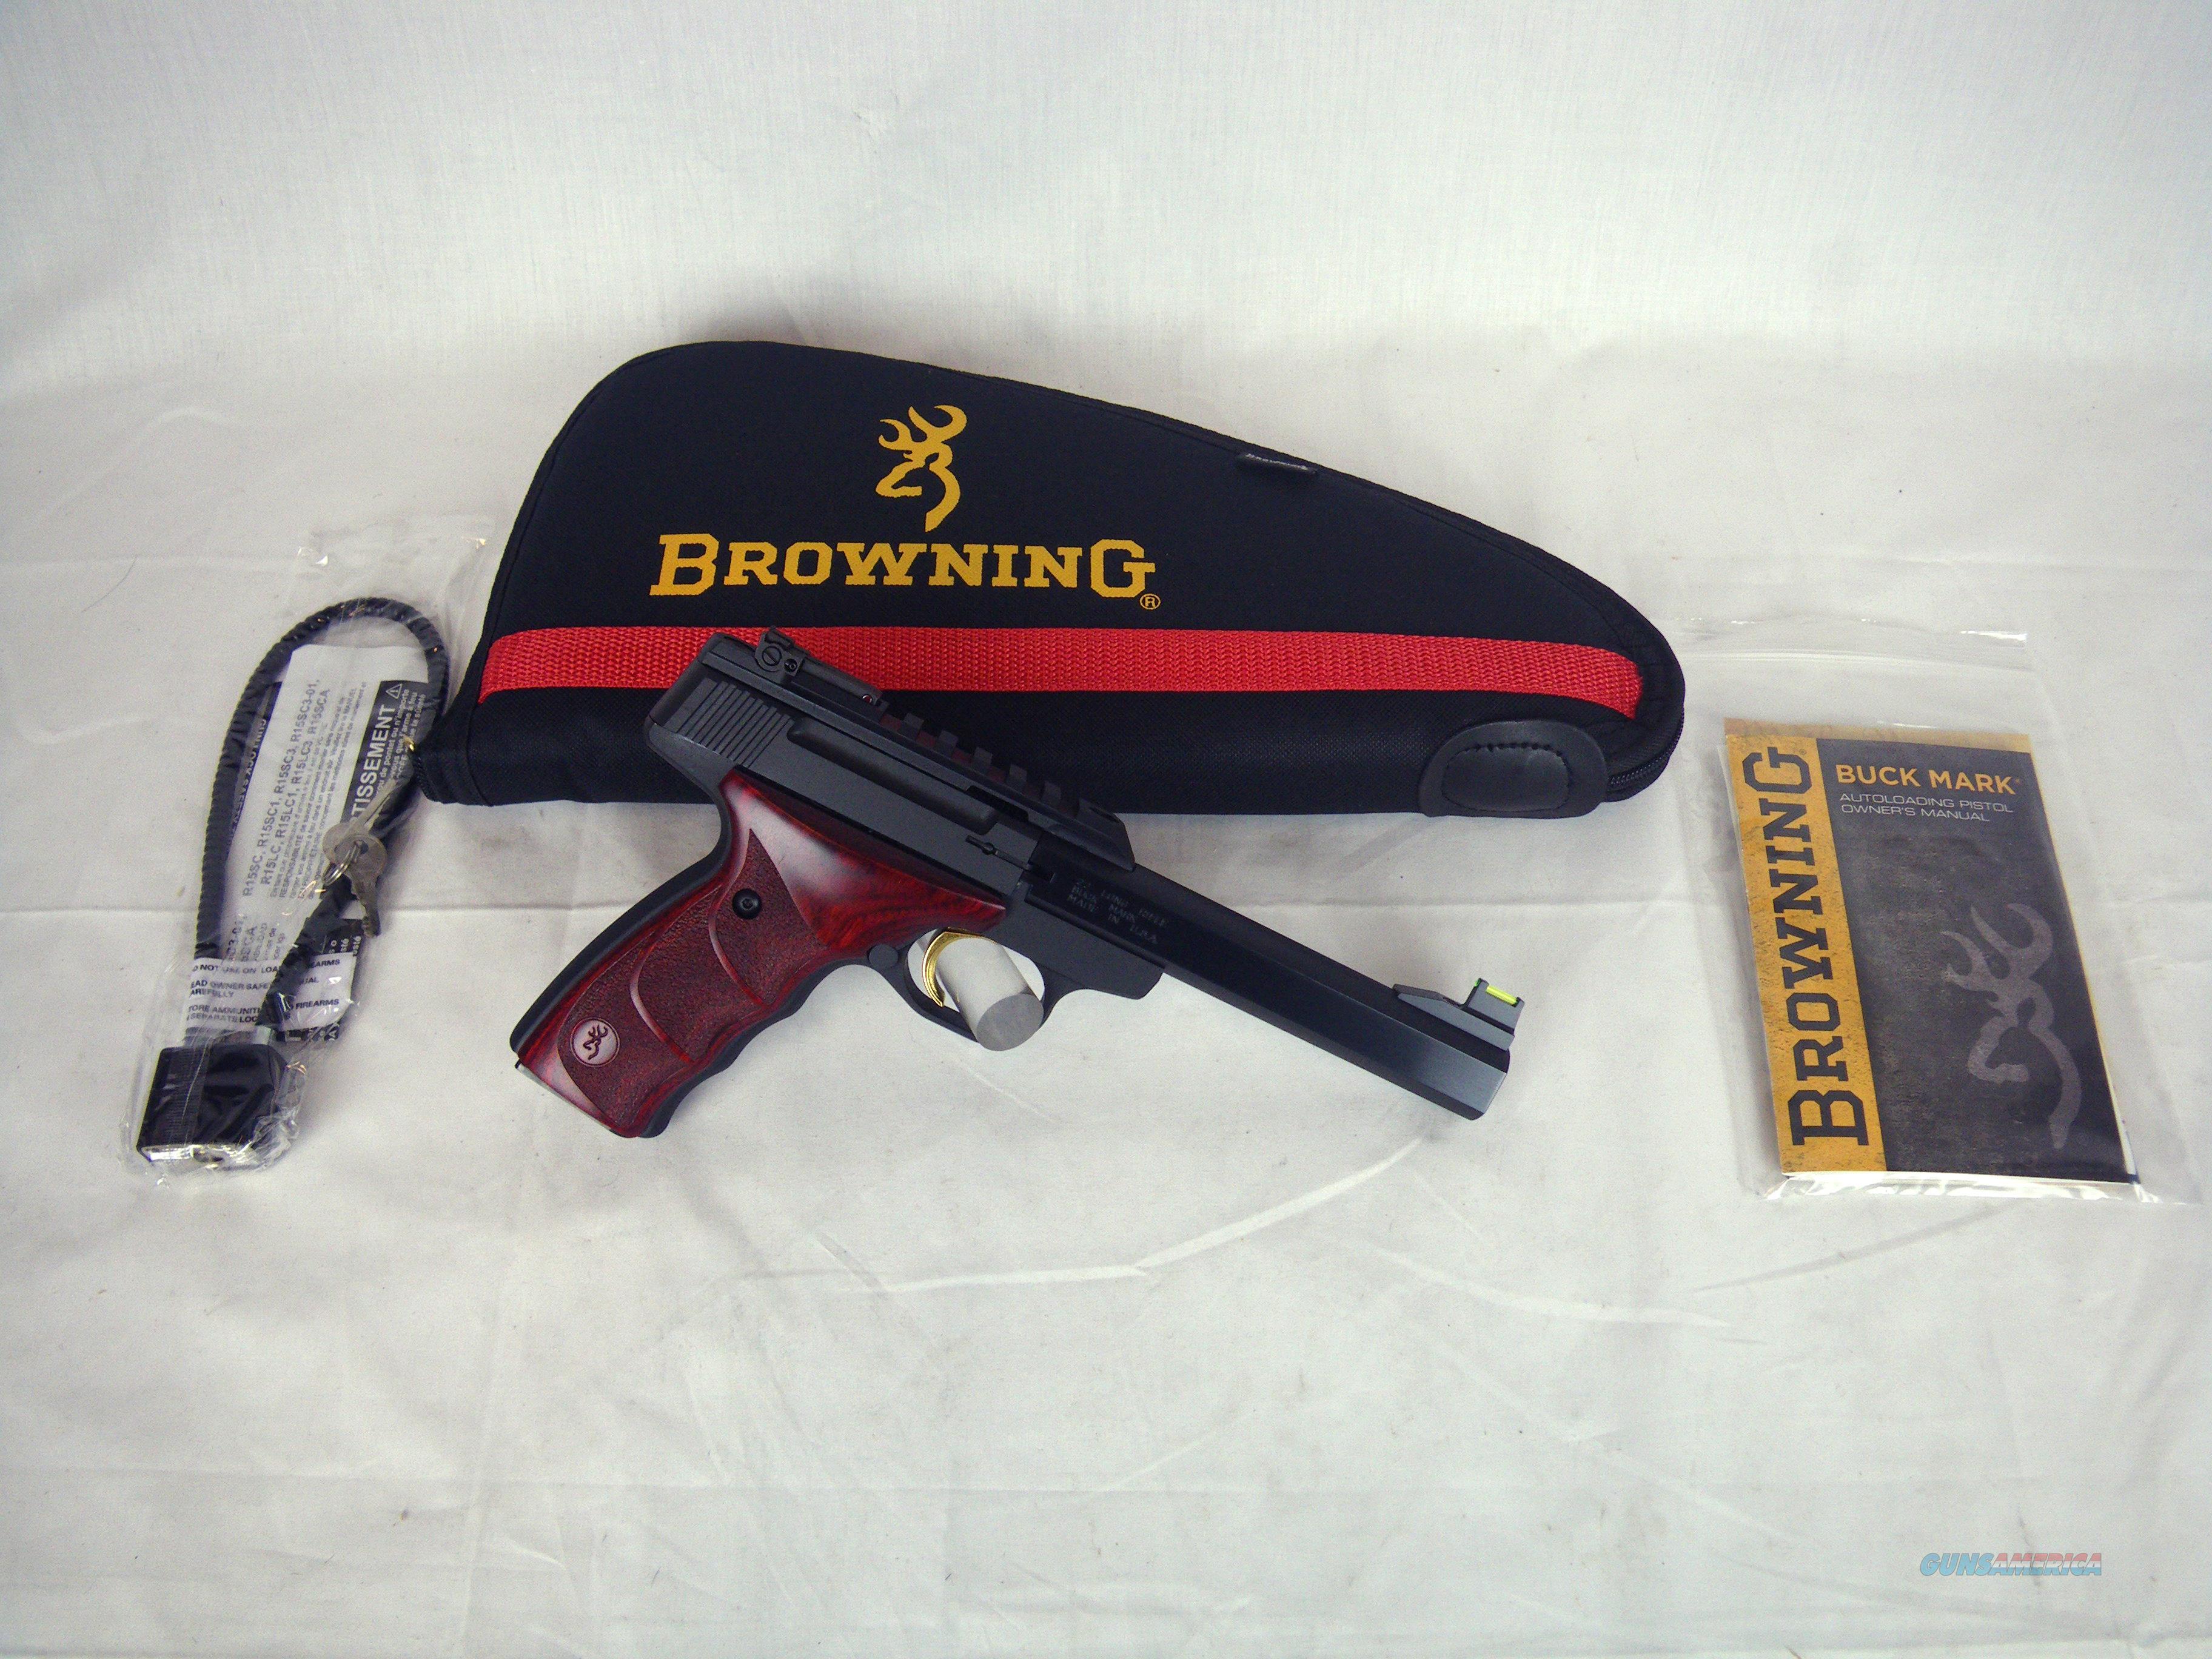 "Browning Buckmark Plus UDX Rosewood 22lr 5.5"" NEW #051533490  Guns > Pistols > Browning Pistols > Buckmark"